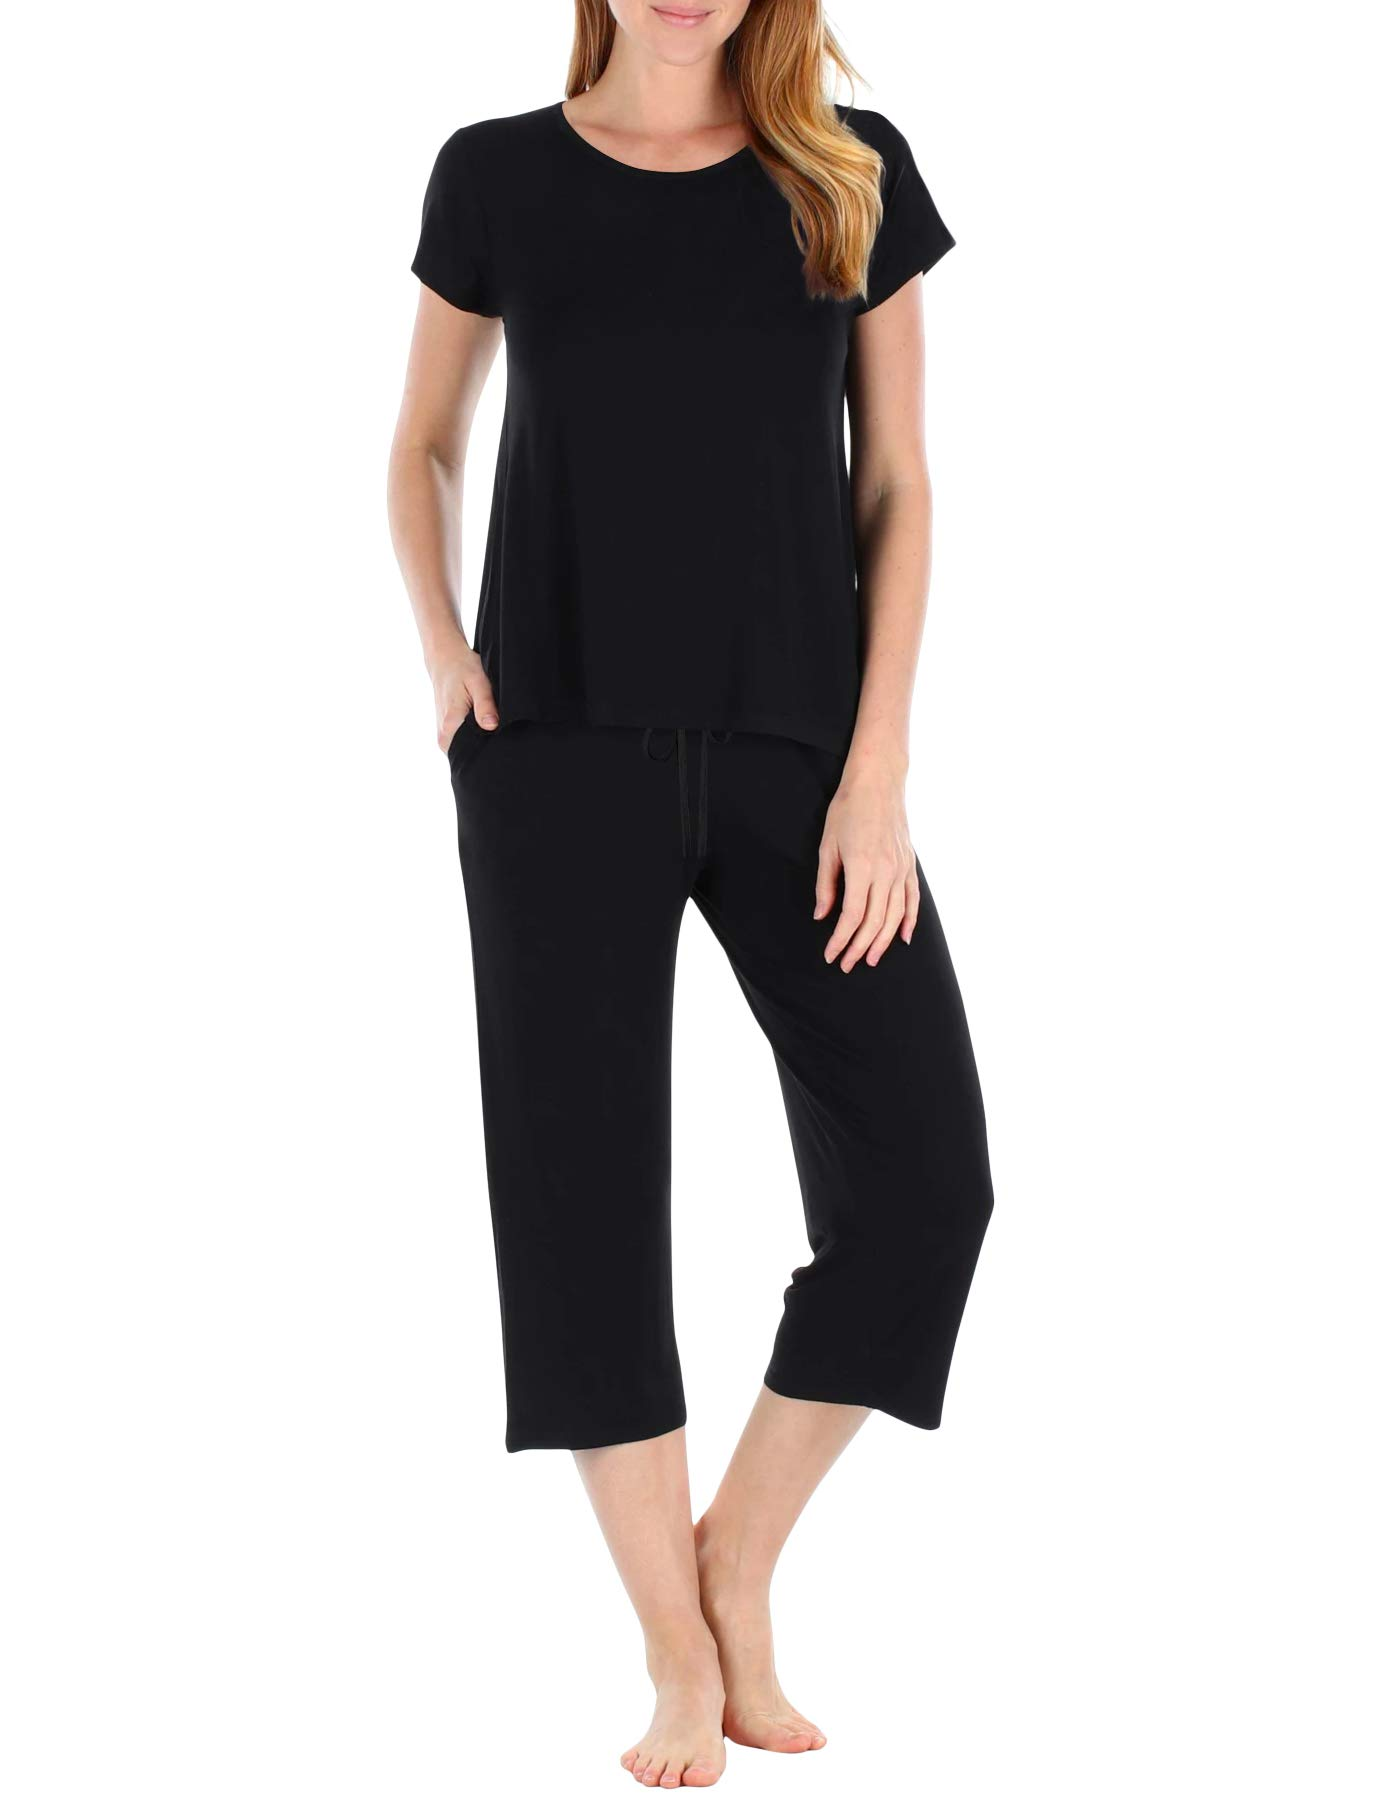 TAIPOVE Women's Soft Pajamas Set Capri Pants and Short Sleeve 2-Piece Pjs Sleepwear Sets Nightwear Lounge Summer